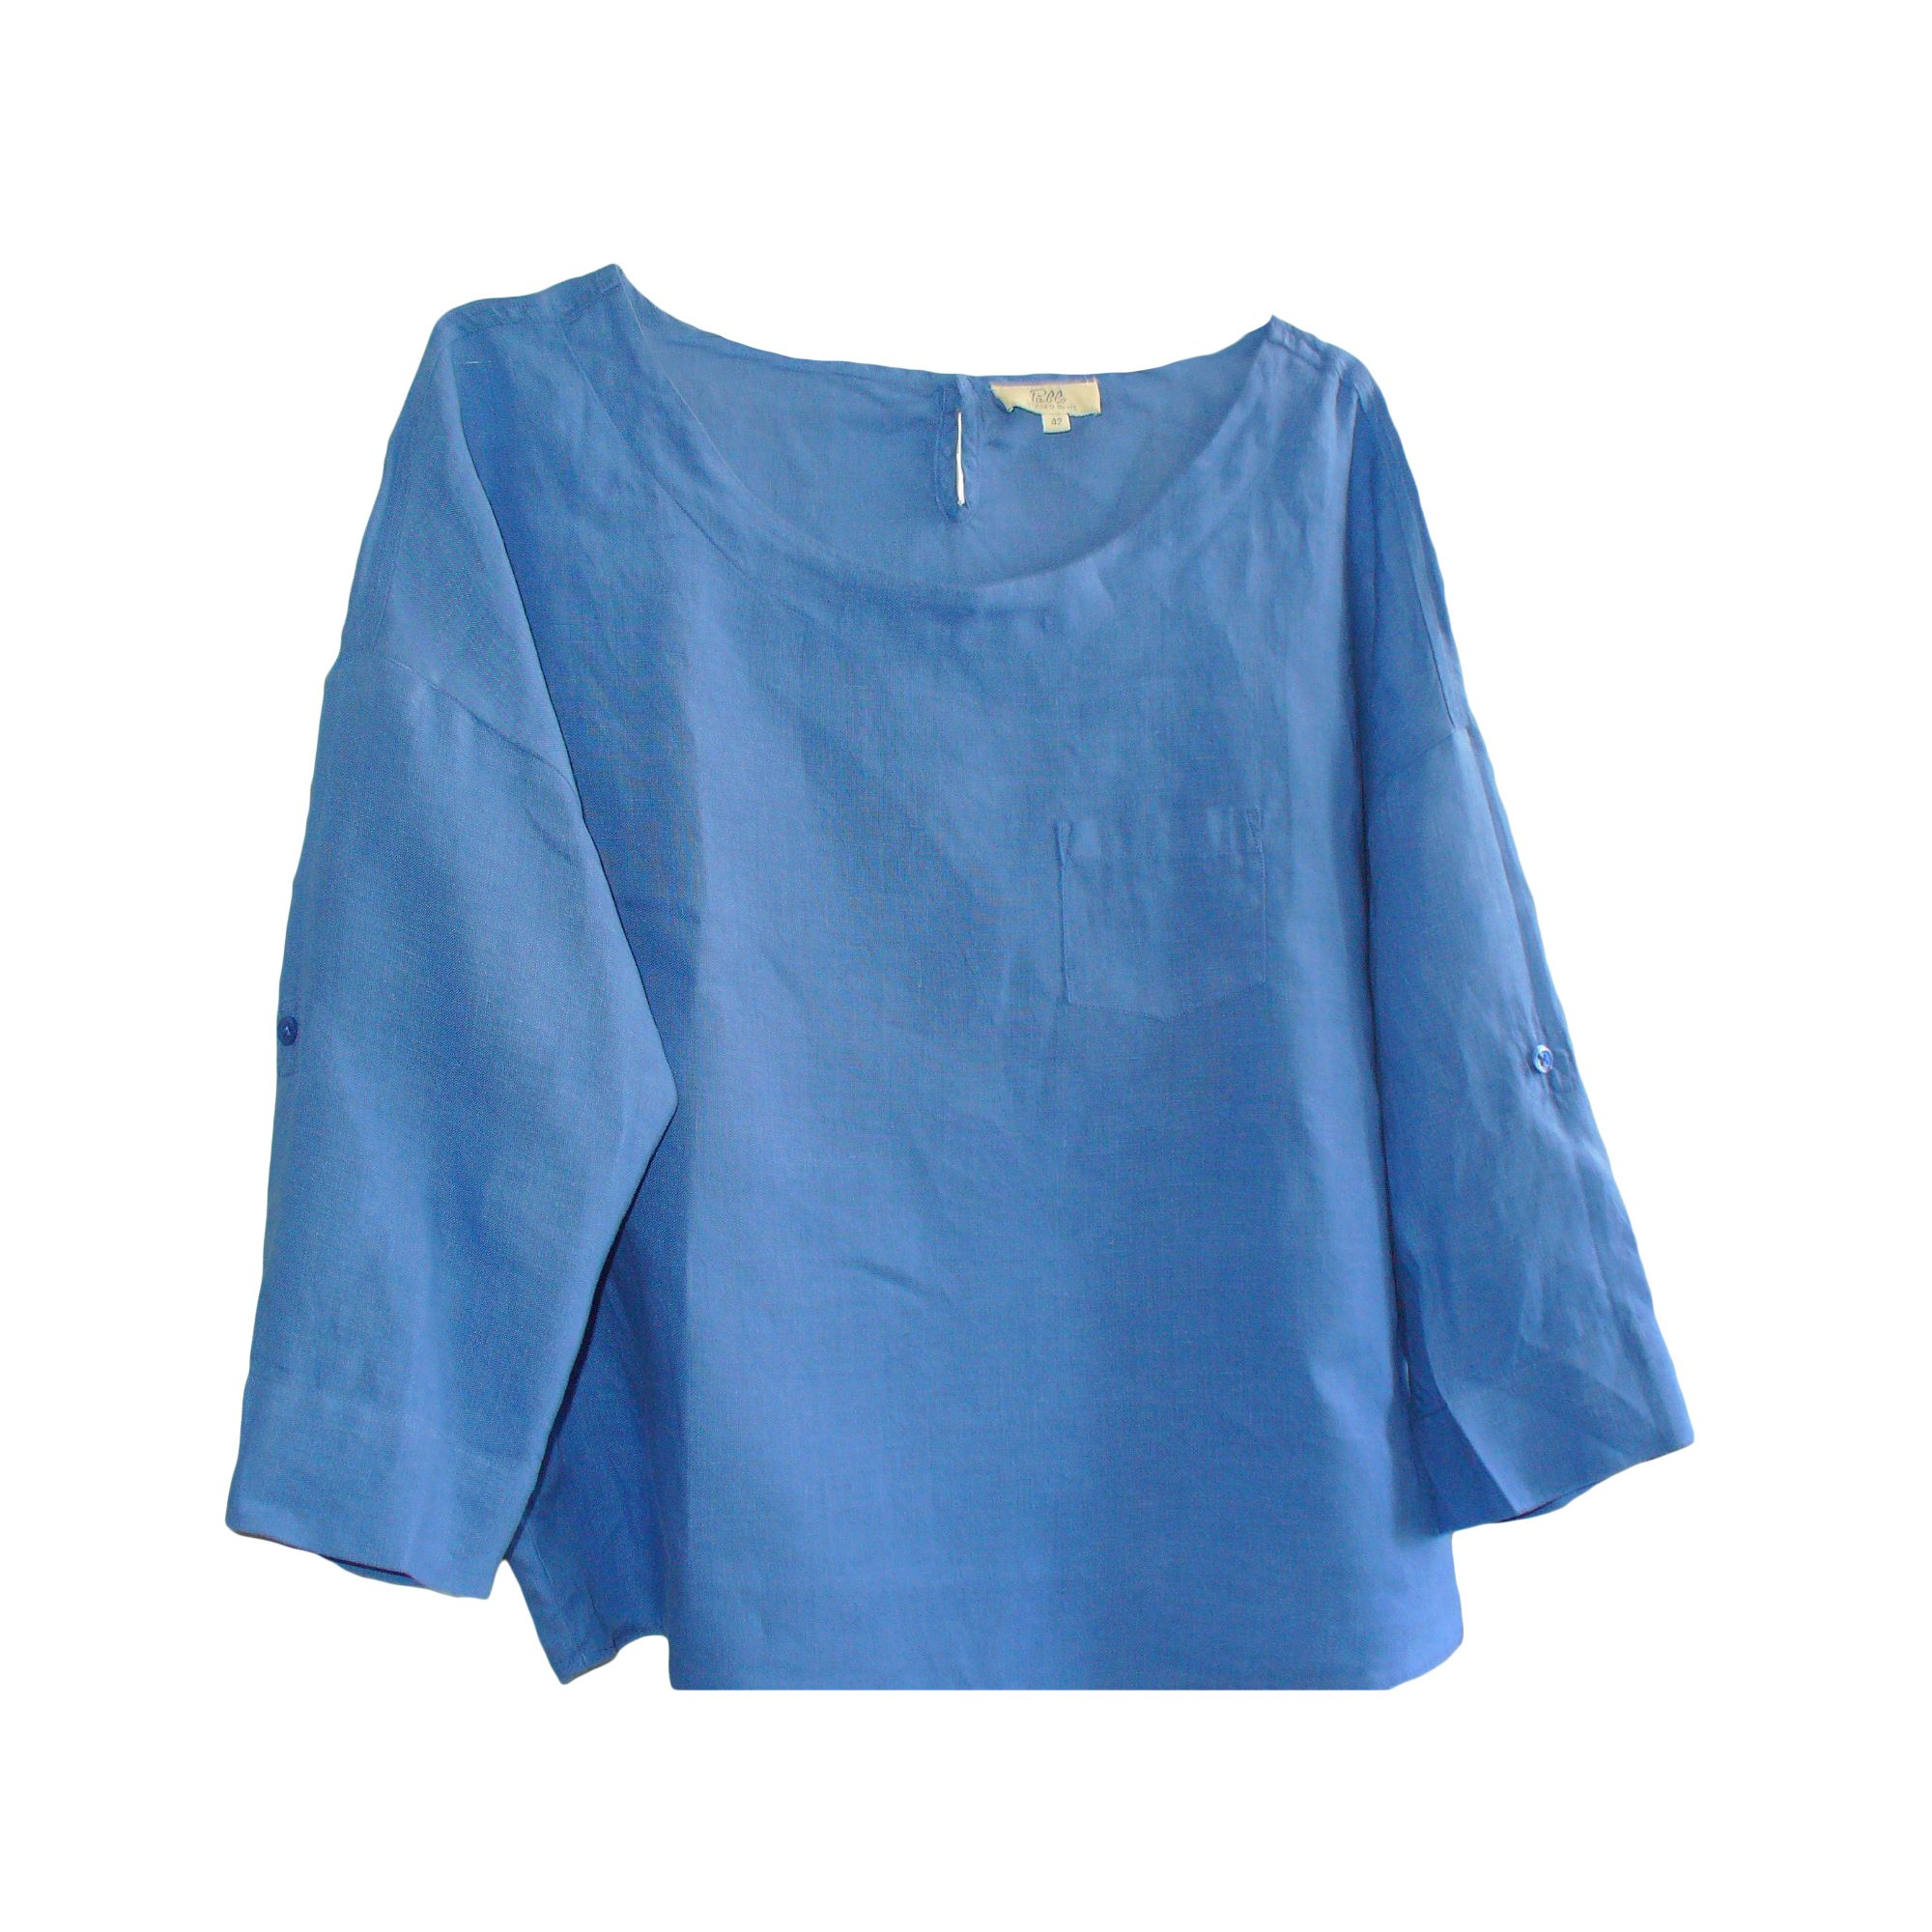 Blouse PABLO PAR GÉRARD DAREL Bleu, bleu marine, bleu turquoise